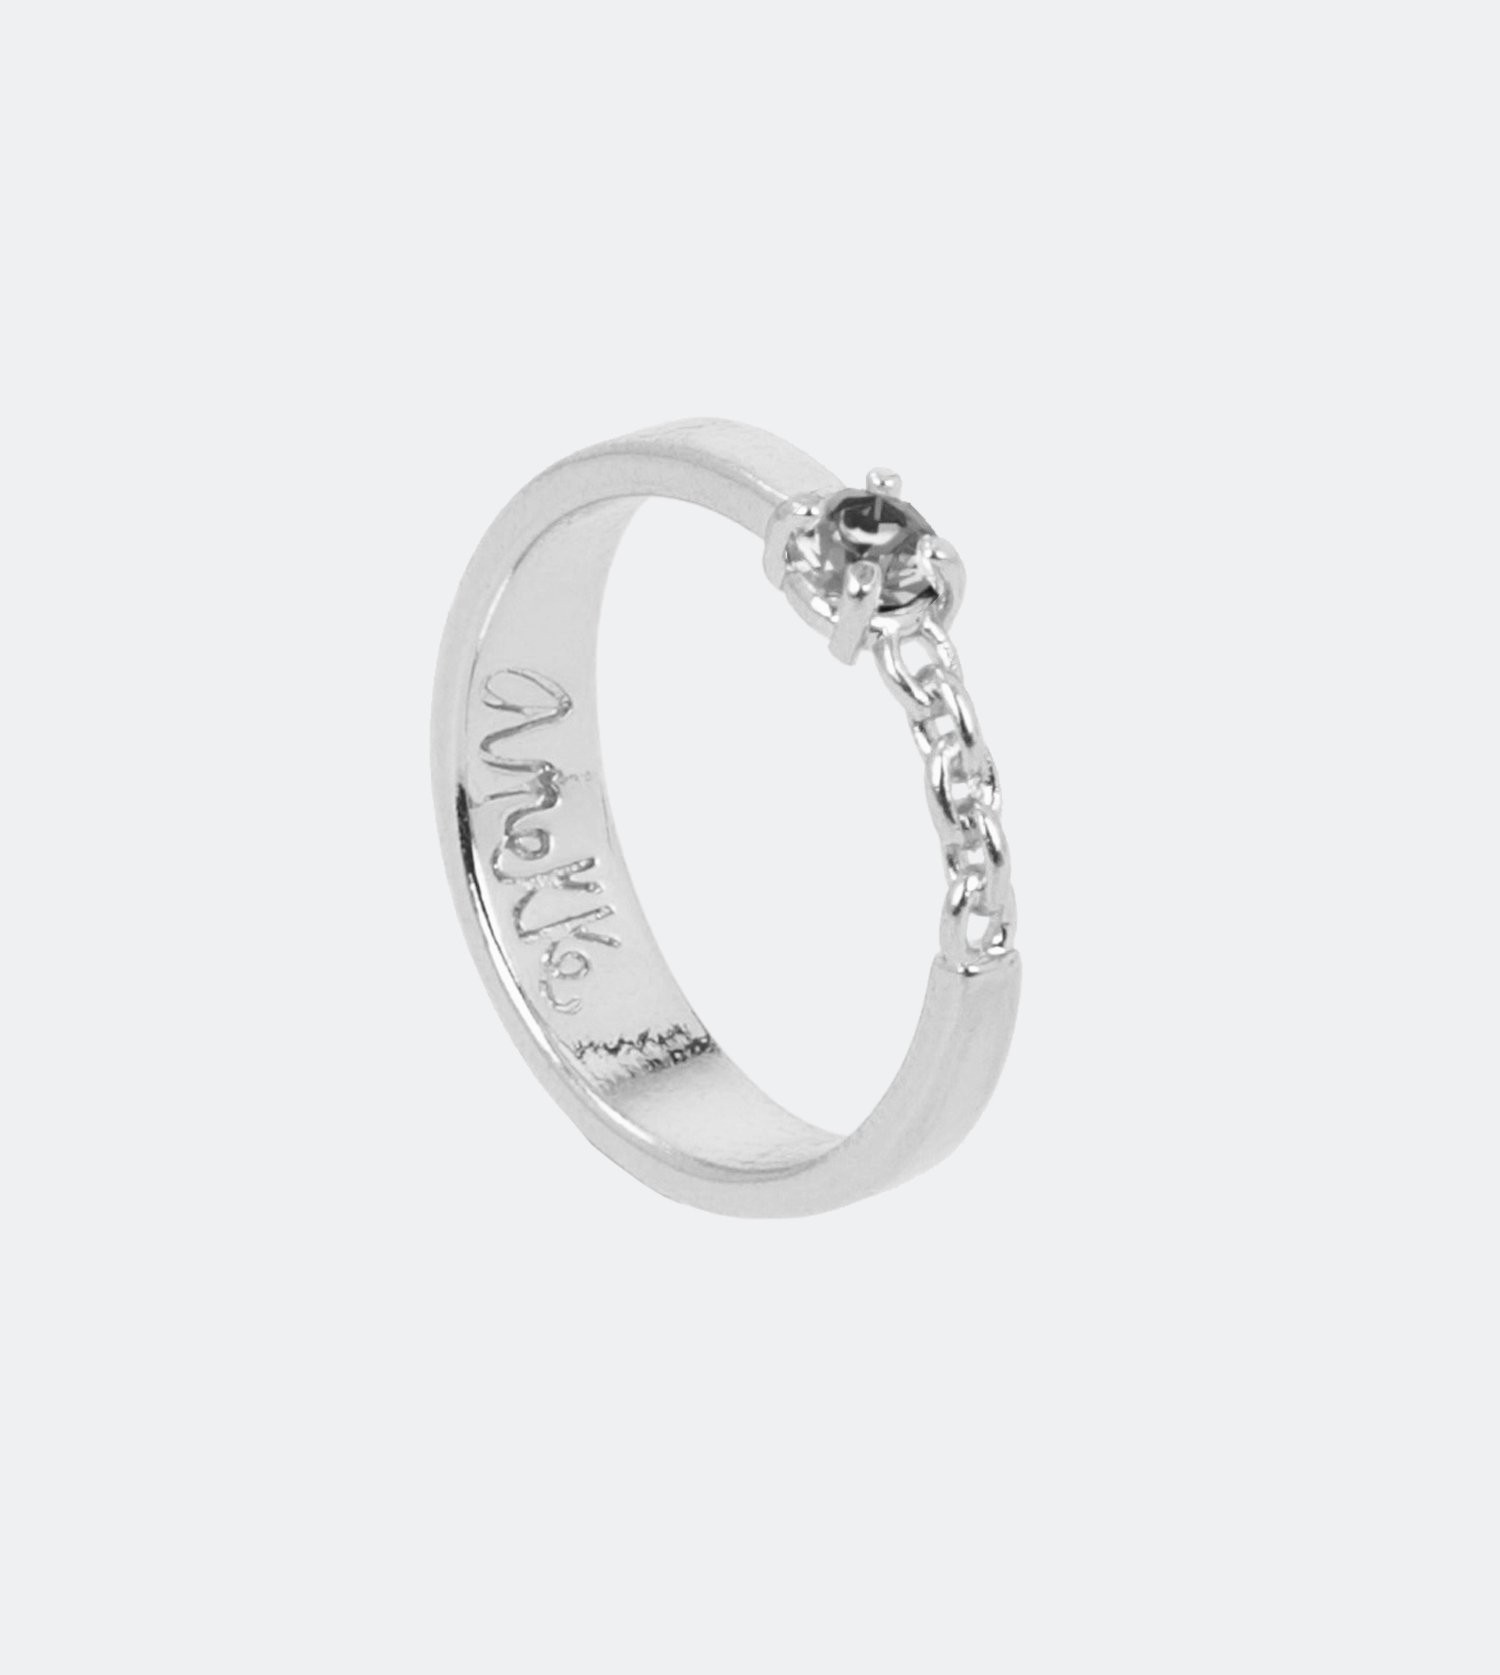 Anekke Jewelery 31702-26-112S